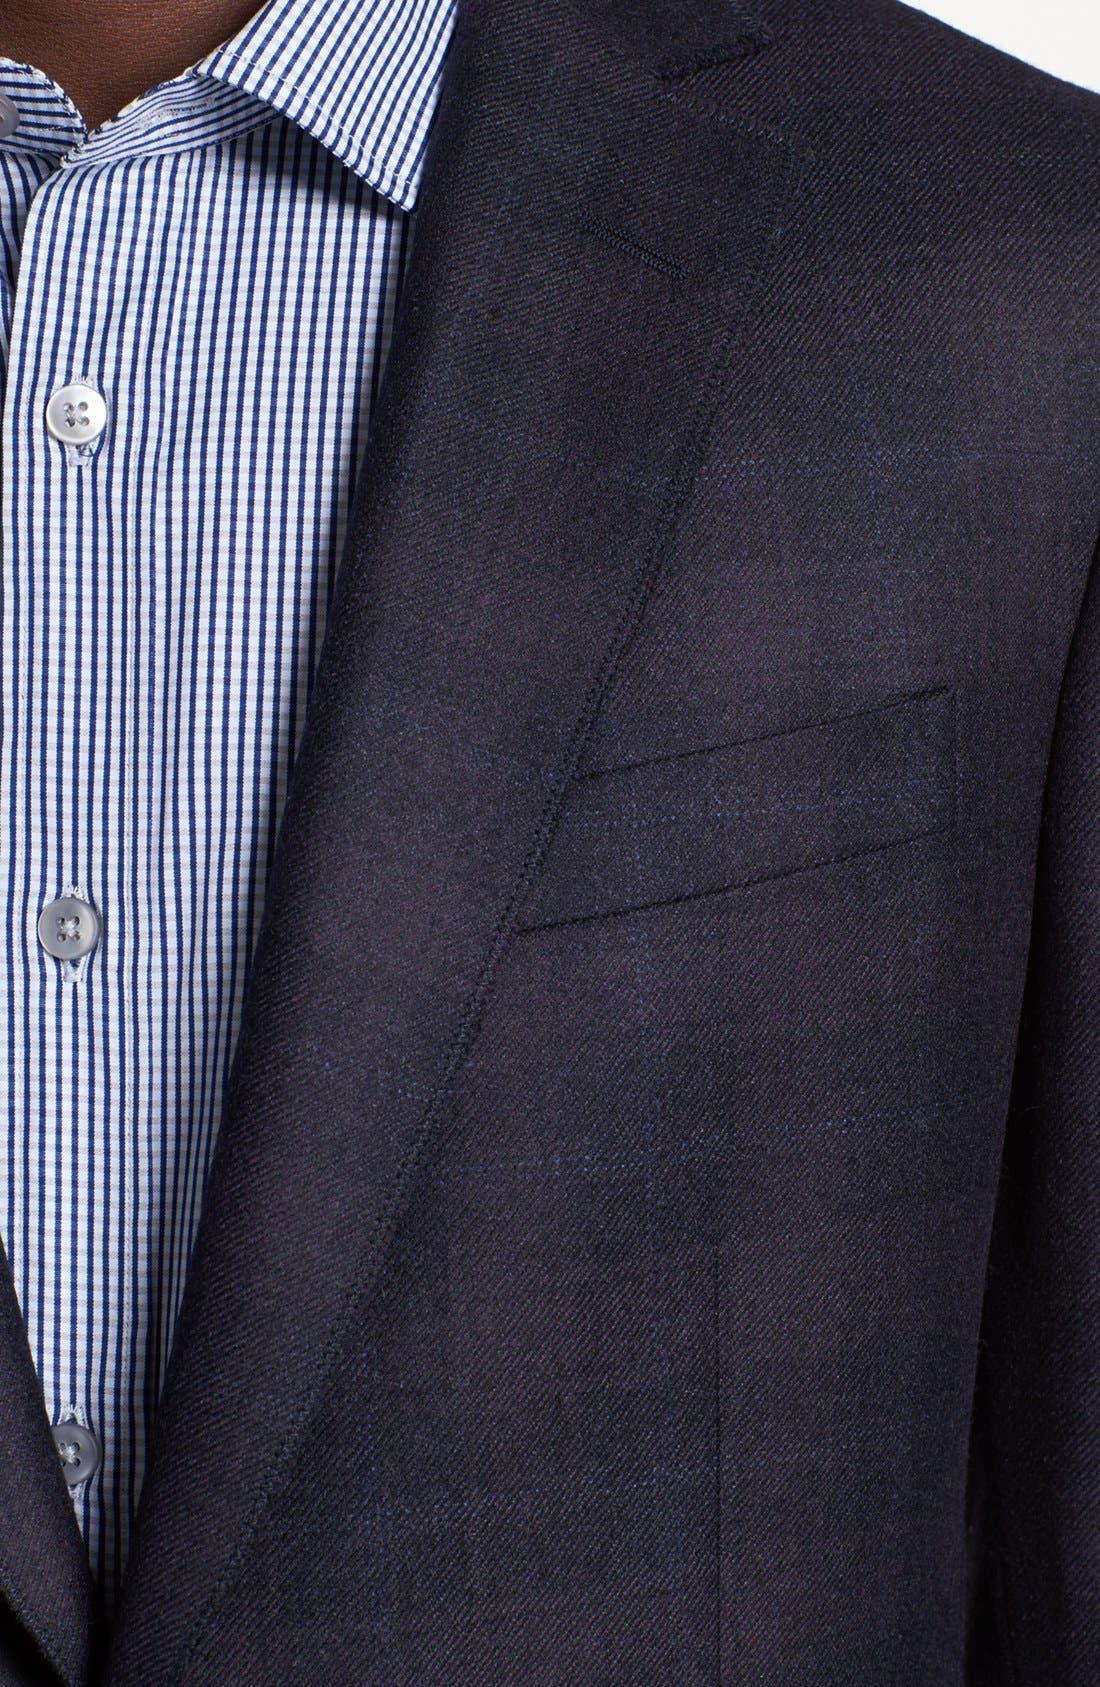 Alternate Image 2  - Z Zegna Drop 8 Fit Check Plaid Sportcoat